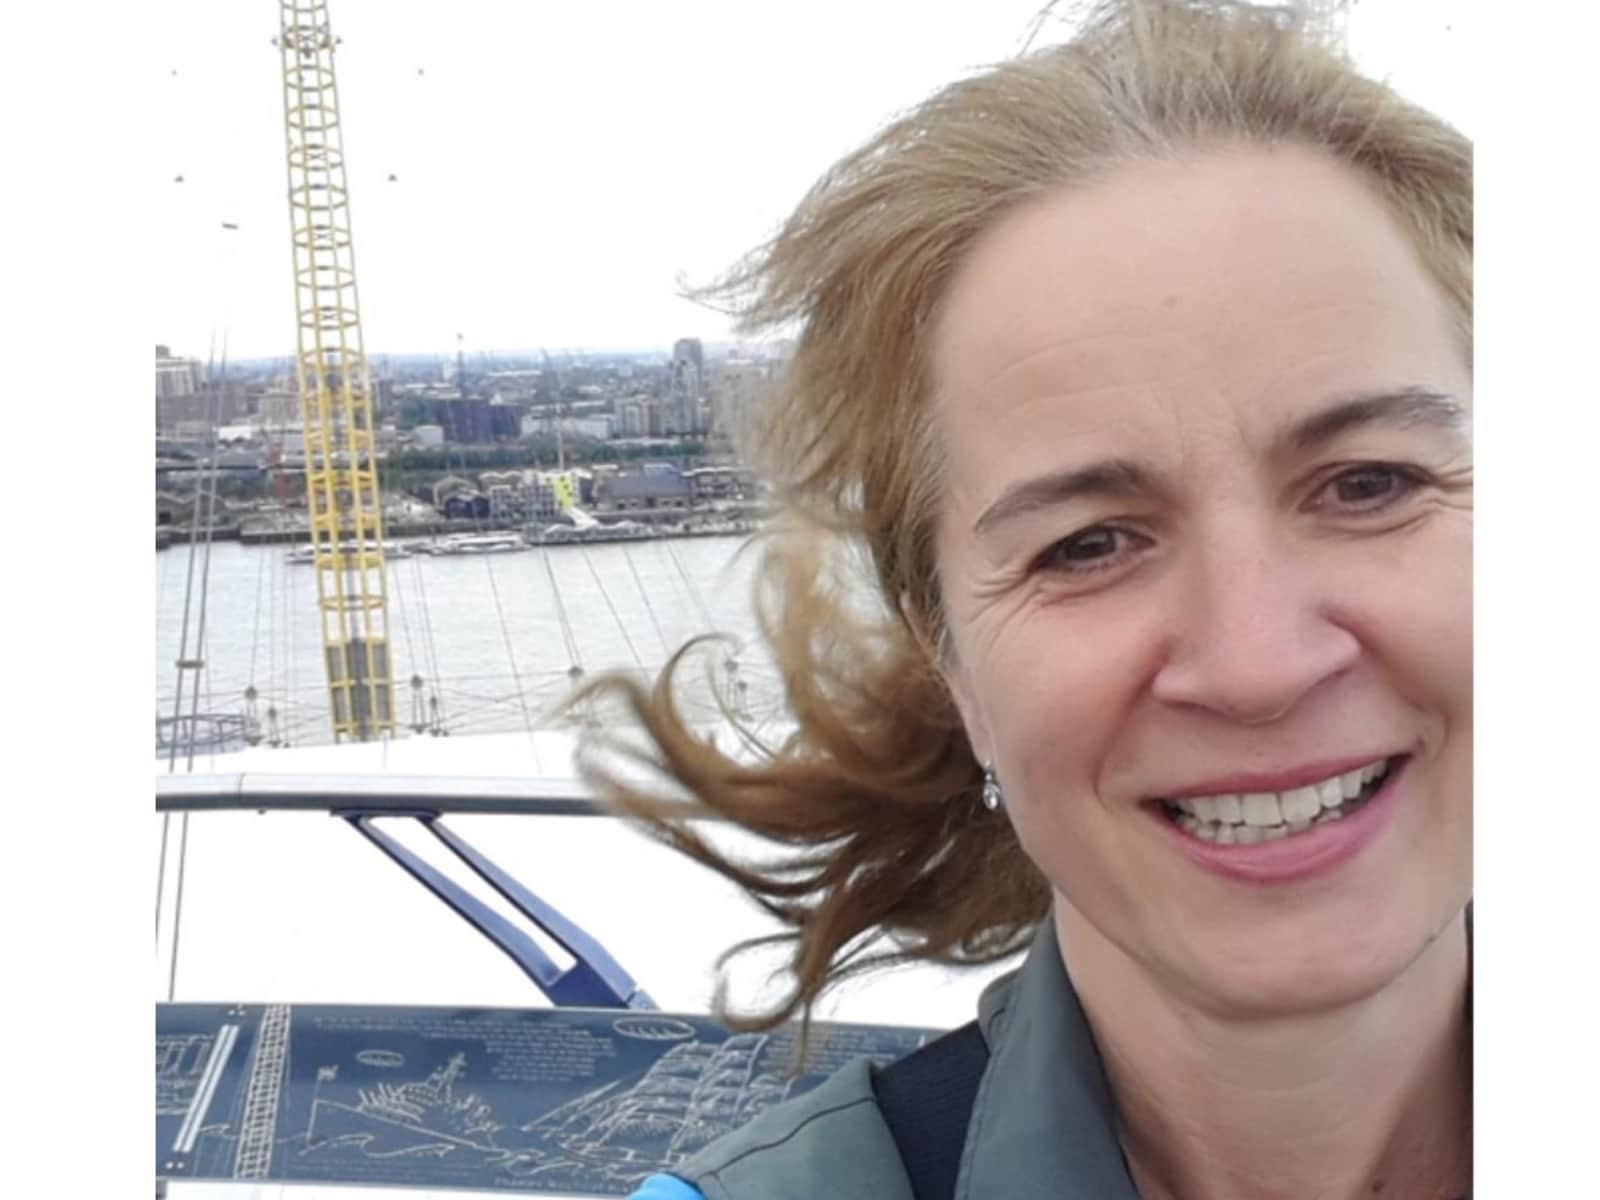 Helen from London, United Kingdom